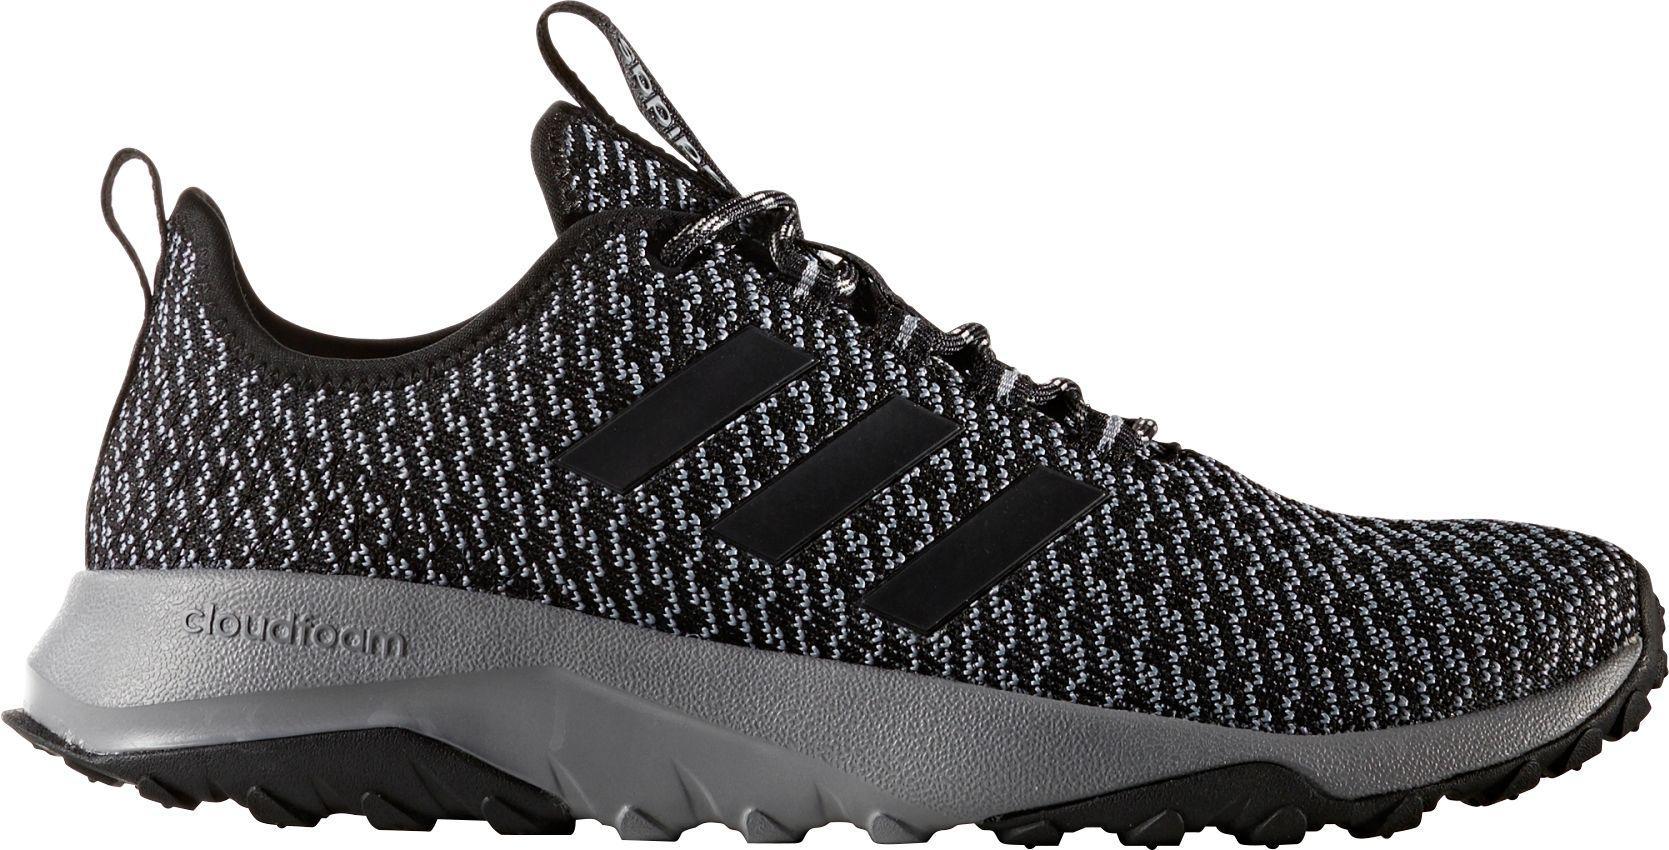 huge discount e1c82 db368 Lyst - adidas Neo Cloudfoam Super Flex Tr Shoes in Black for